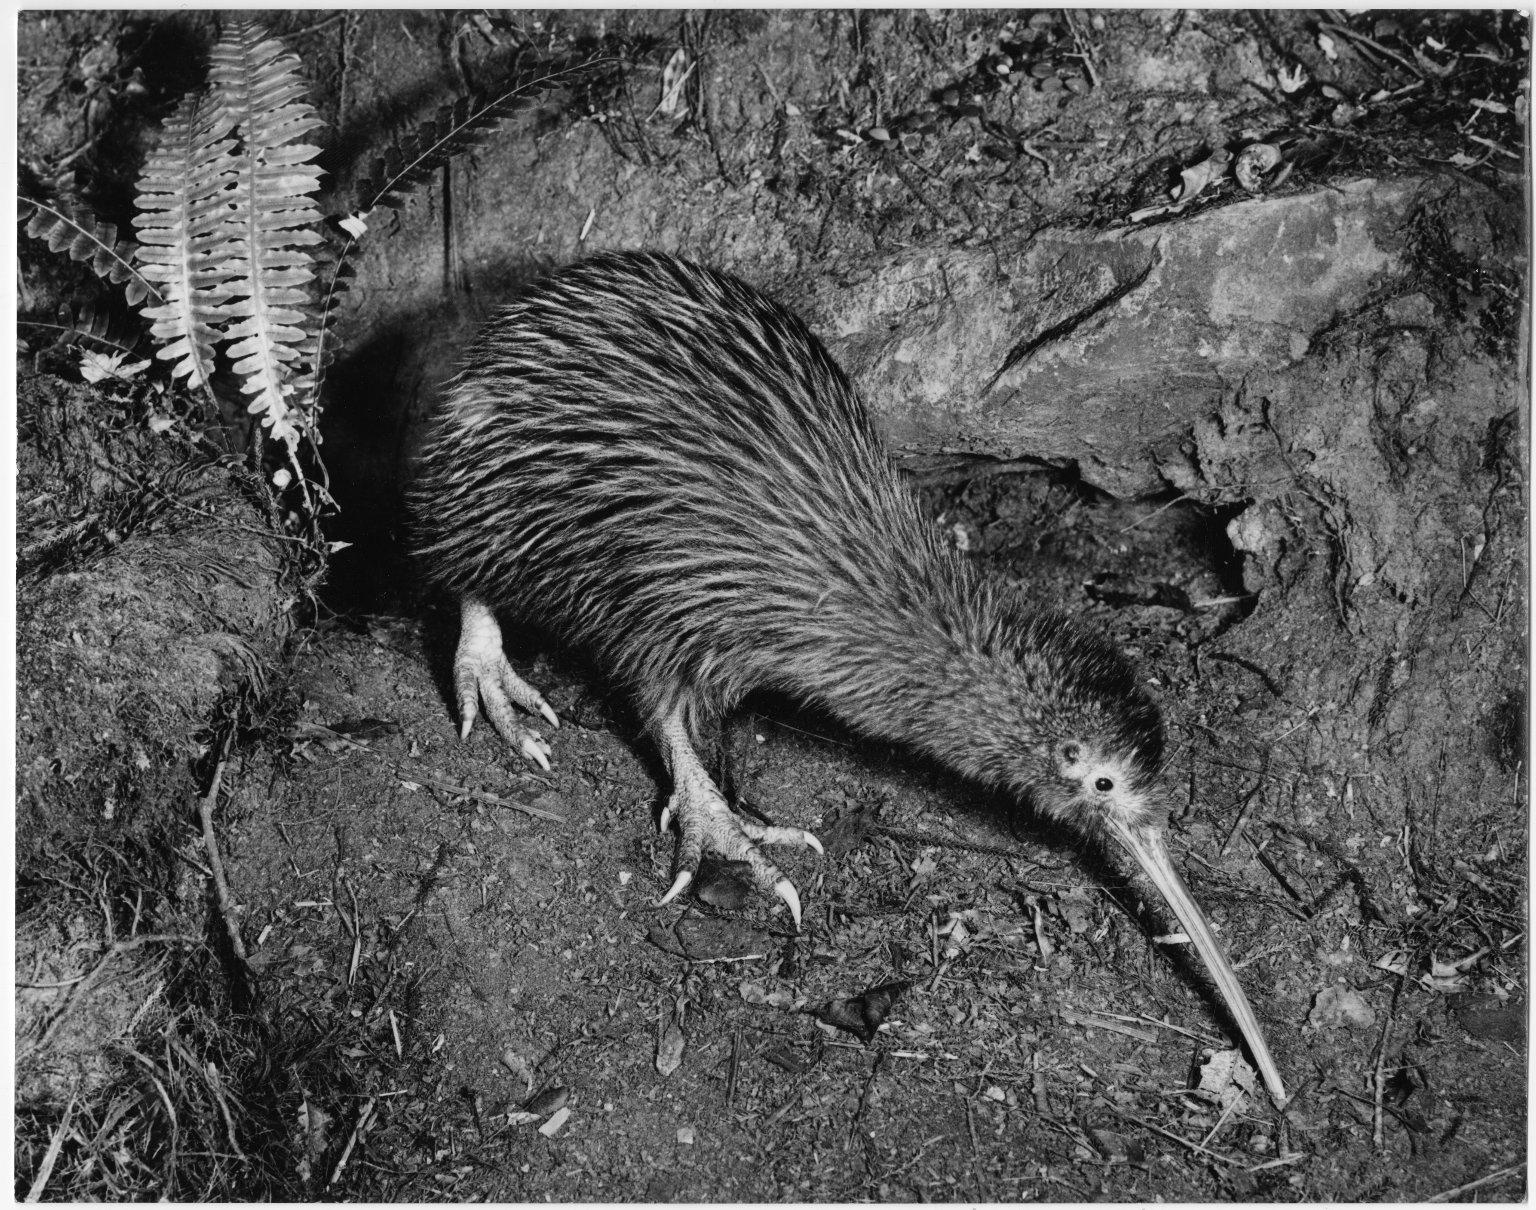 Kiwi, Apteryx australis